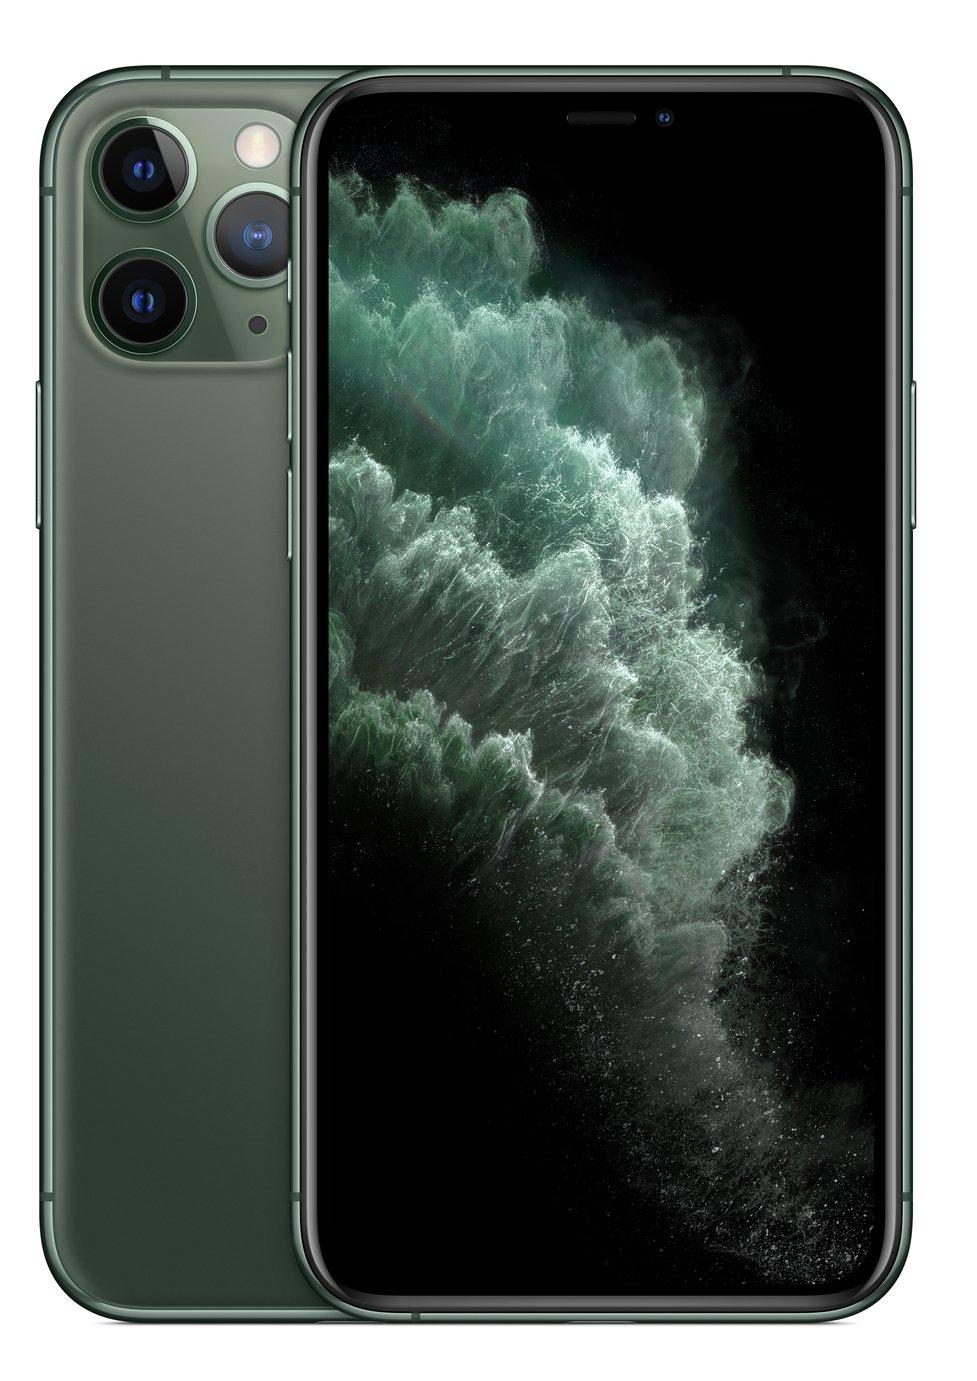 SIM Free iPhone 11 Pro 512GB Midnight Green - Pre-order